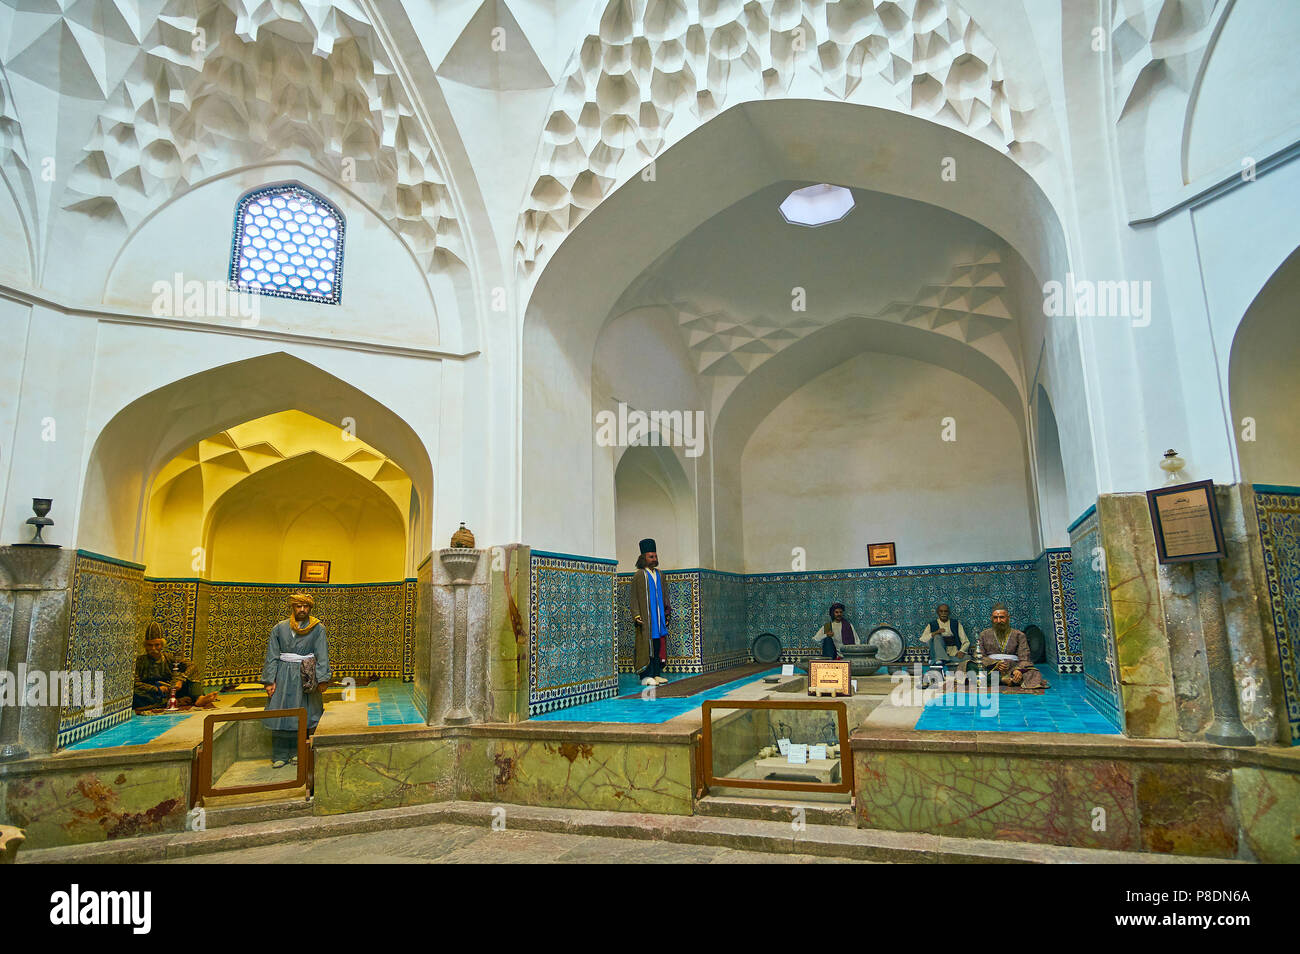 Kerman iran 15 ottobre 2017: hammam e ganjali khan bathhouse